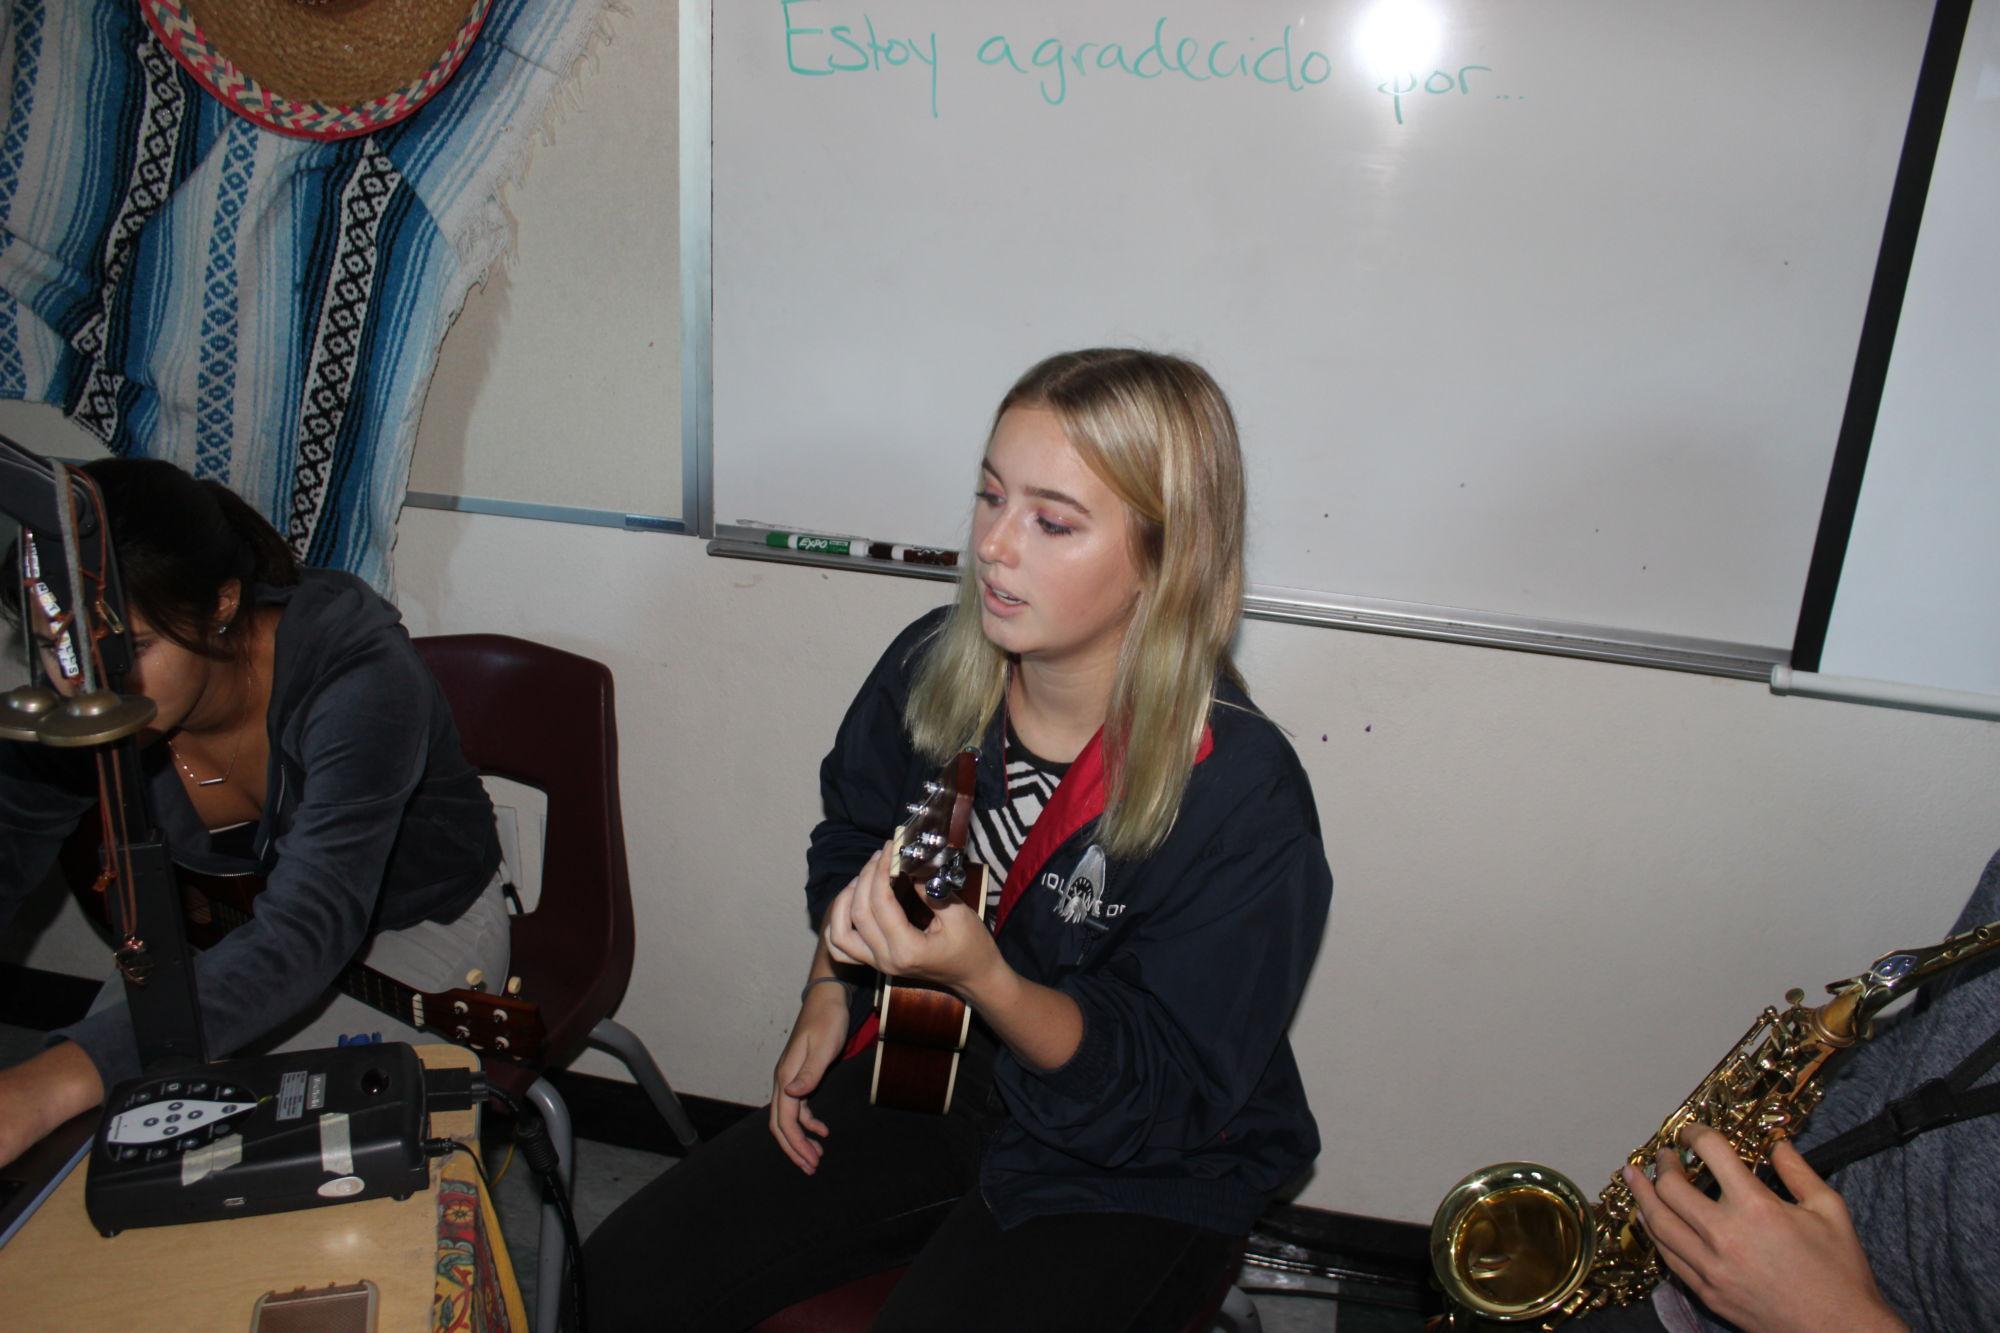 Sophomore Nikki Orrick shares her music with Redwood community